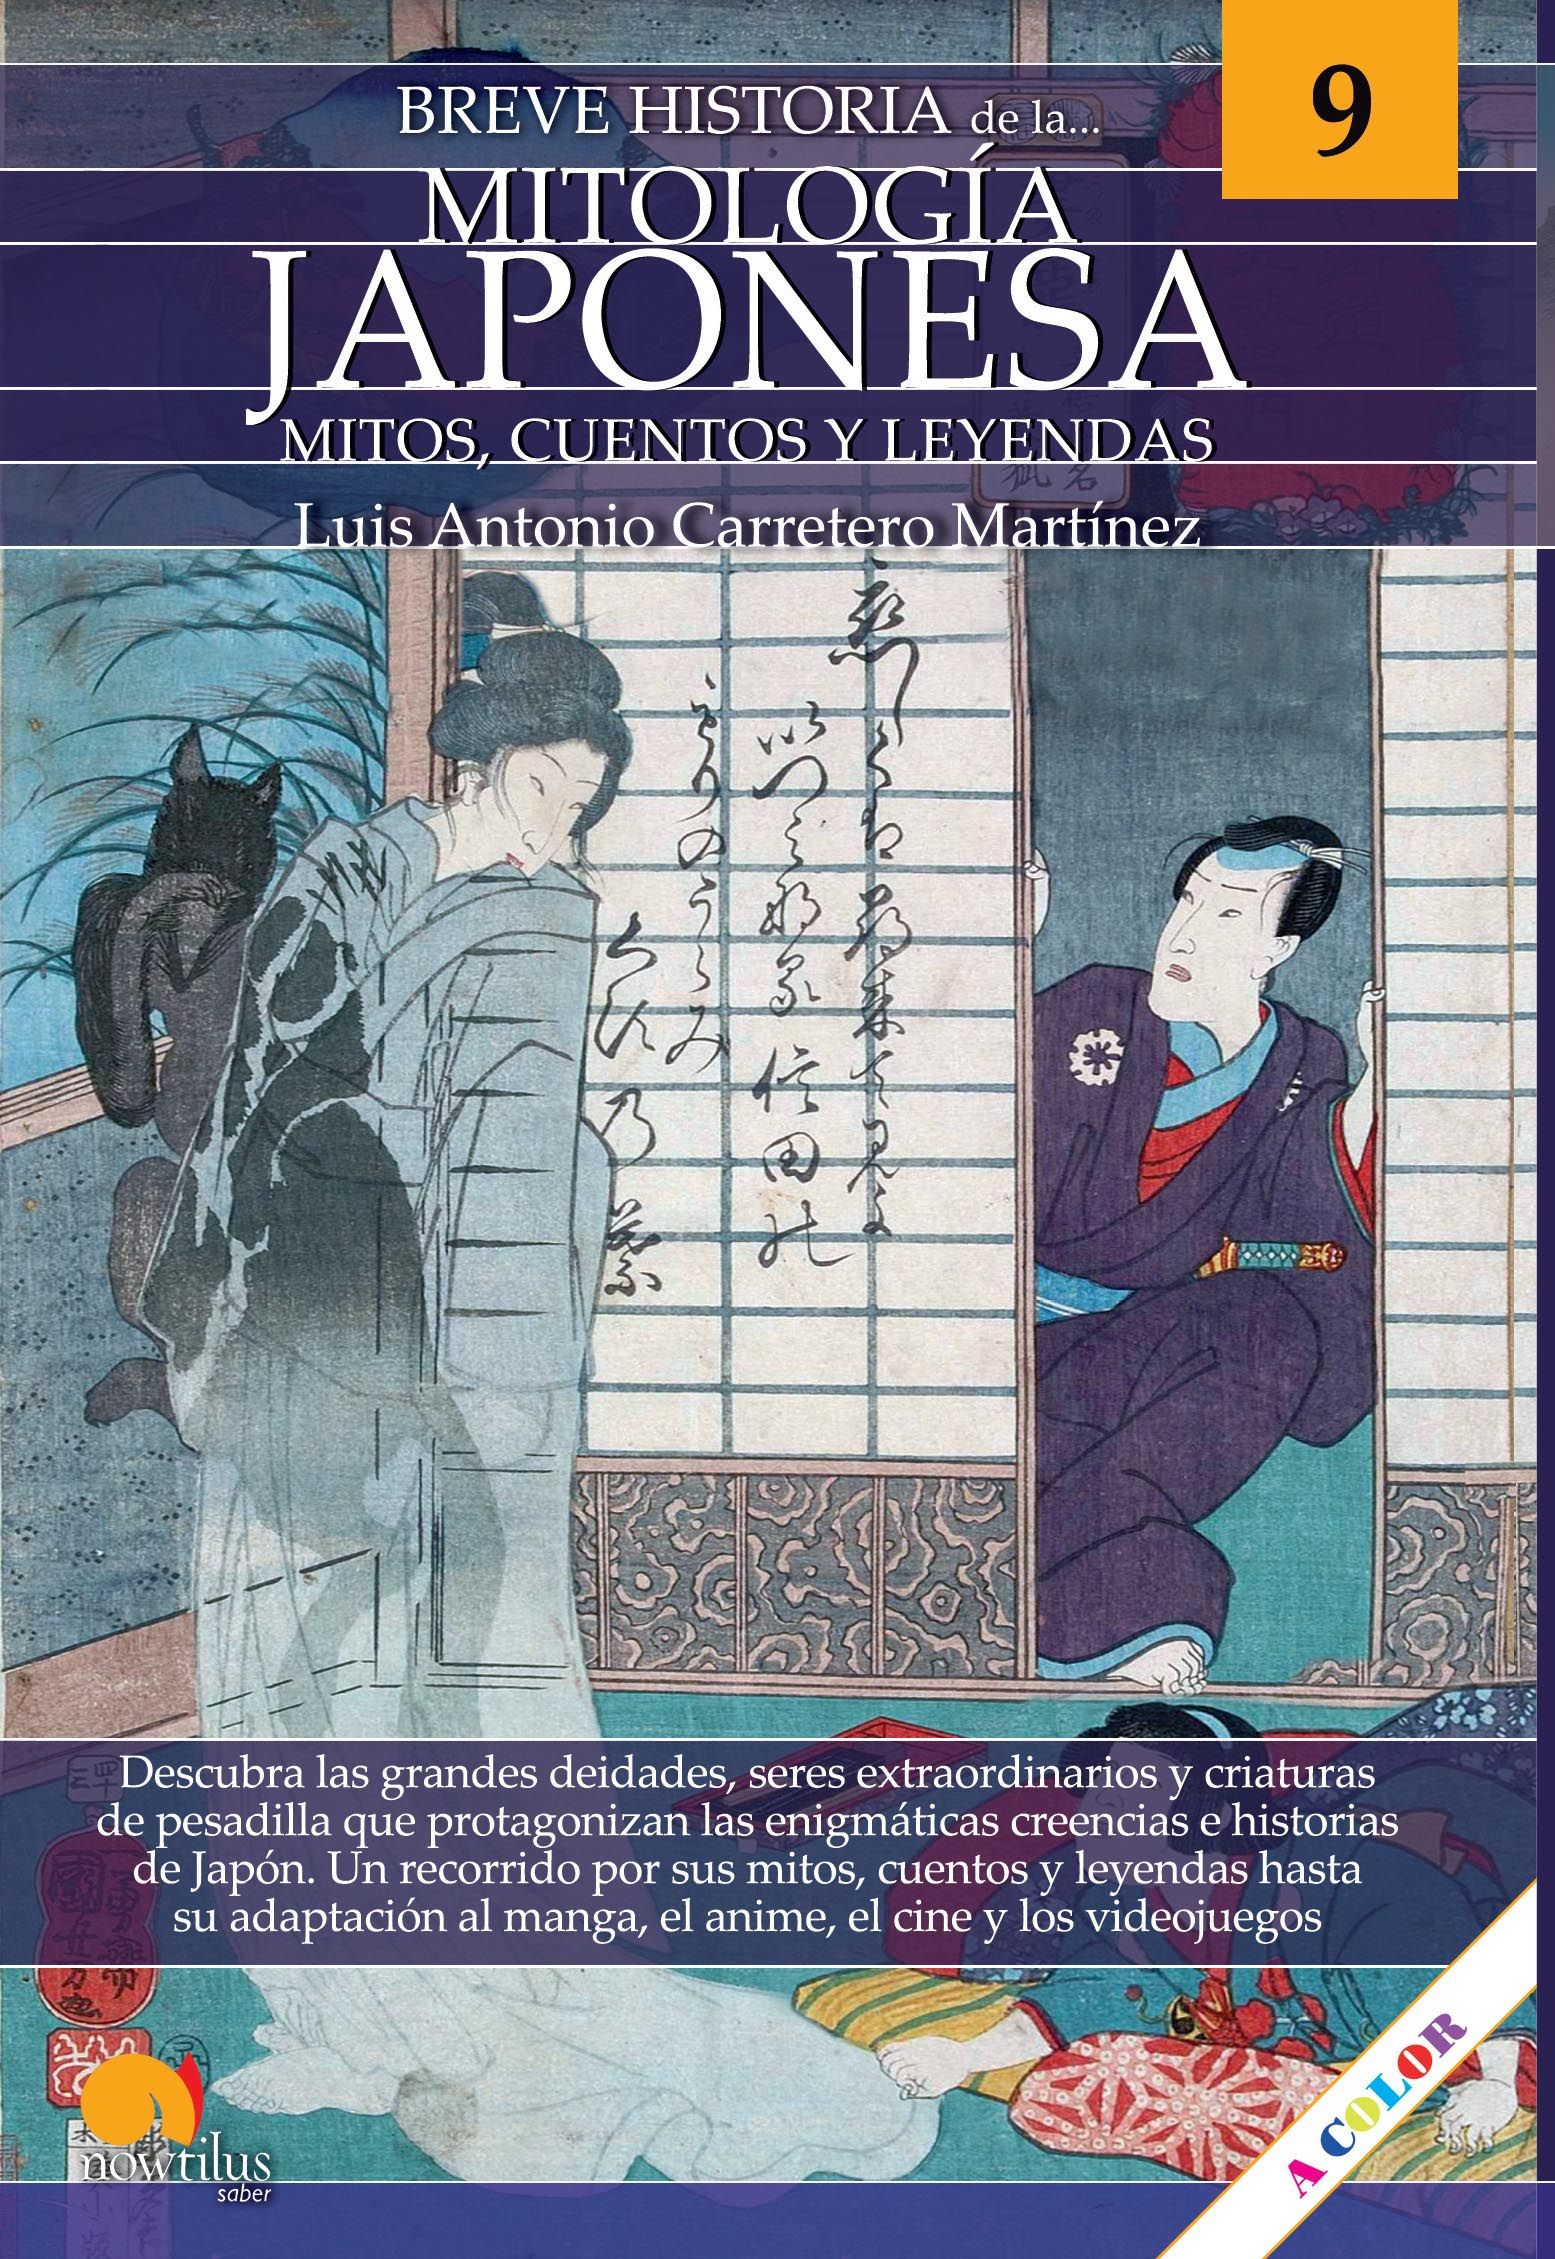 BREVE HISTORIA DE LA MITOLOGIA JAPONESA